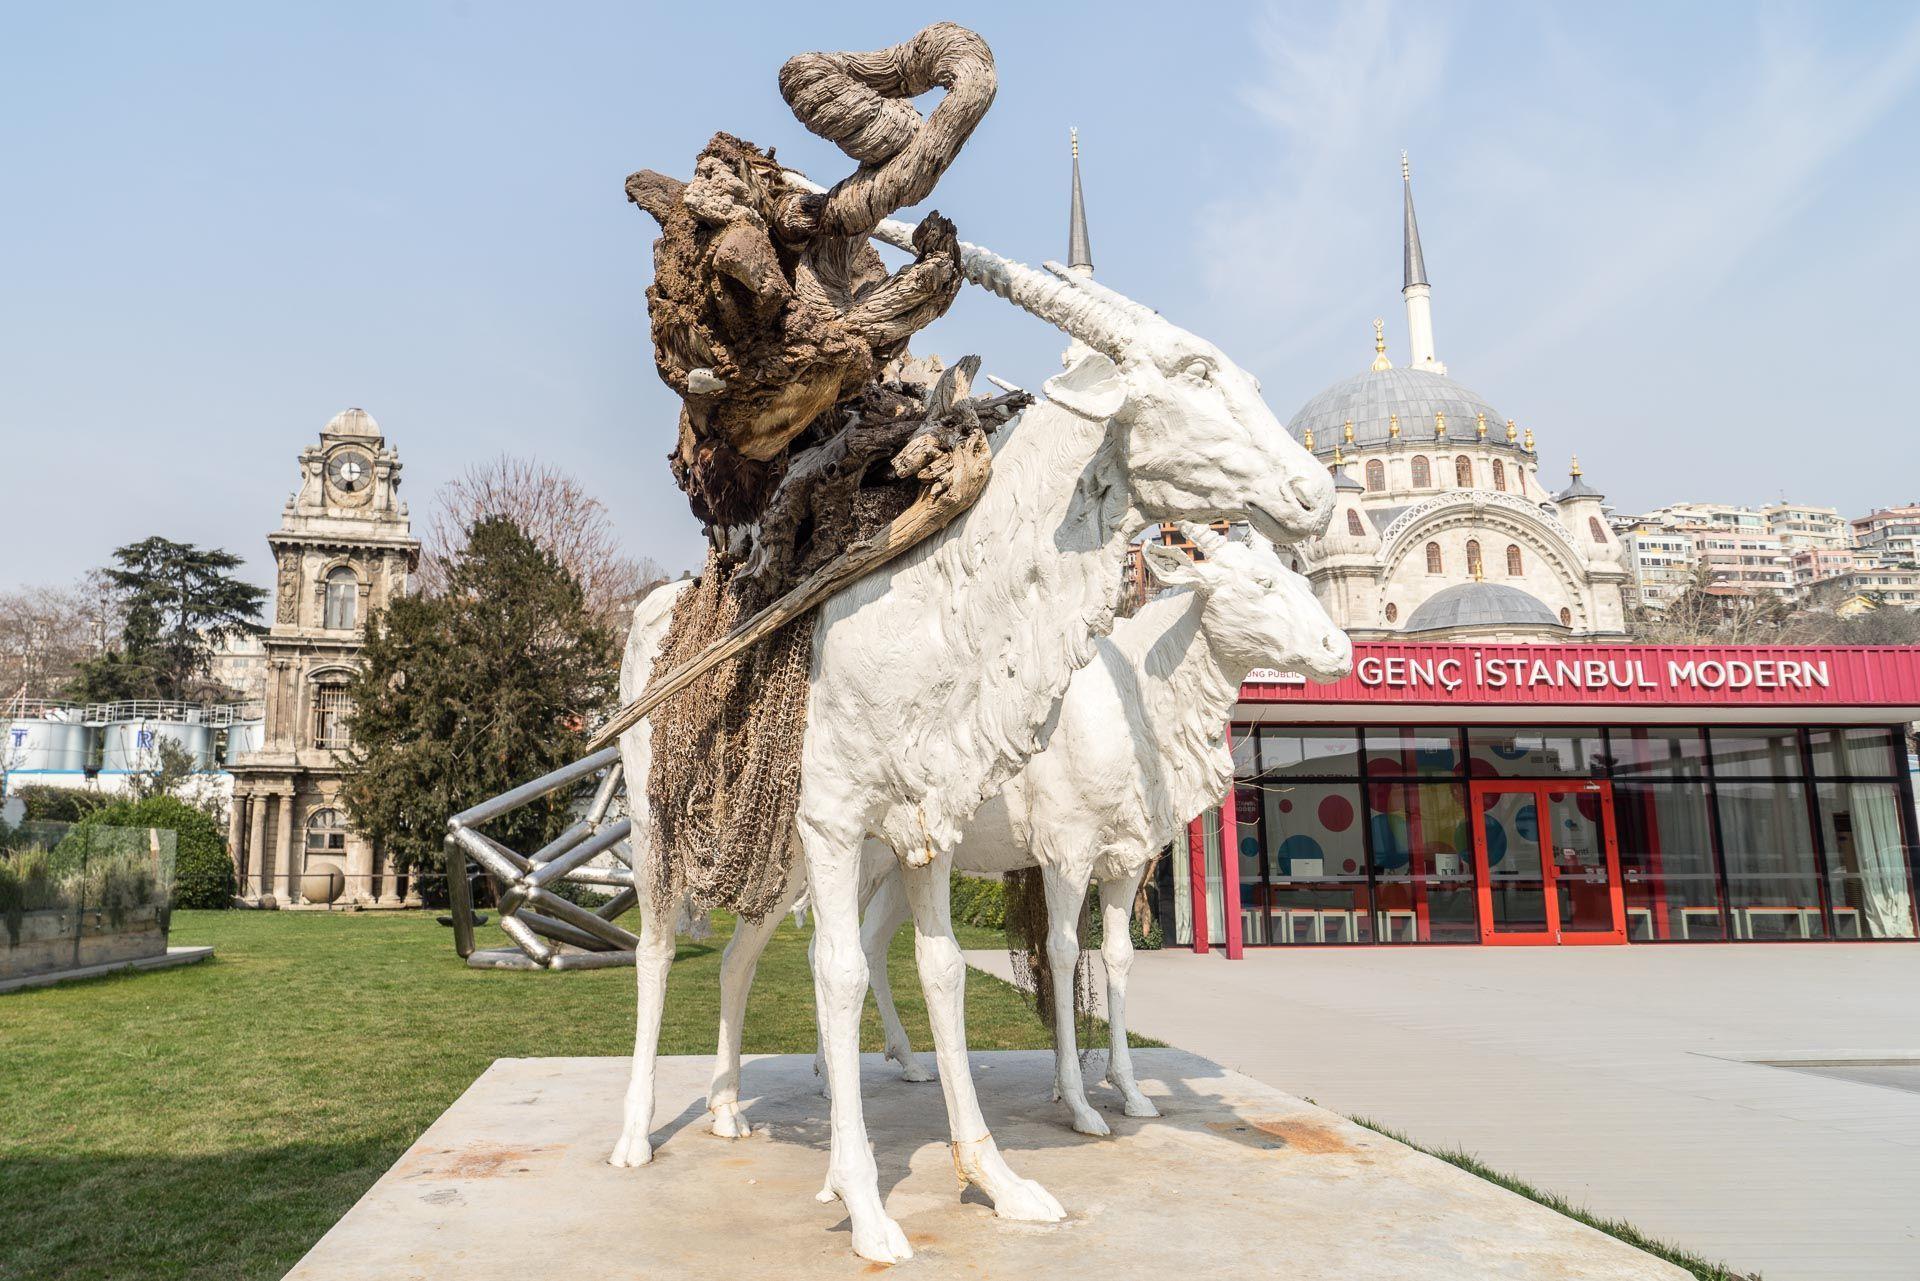 Lesvoyageuses-voyage-en-turquie-itineraire-Istanbul-6